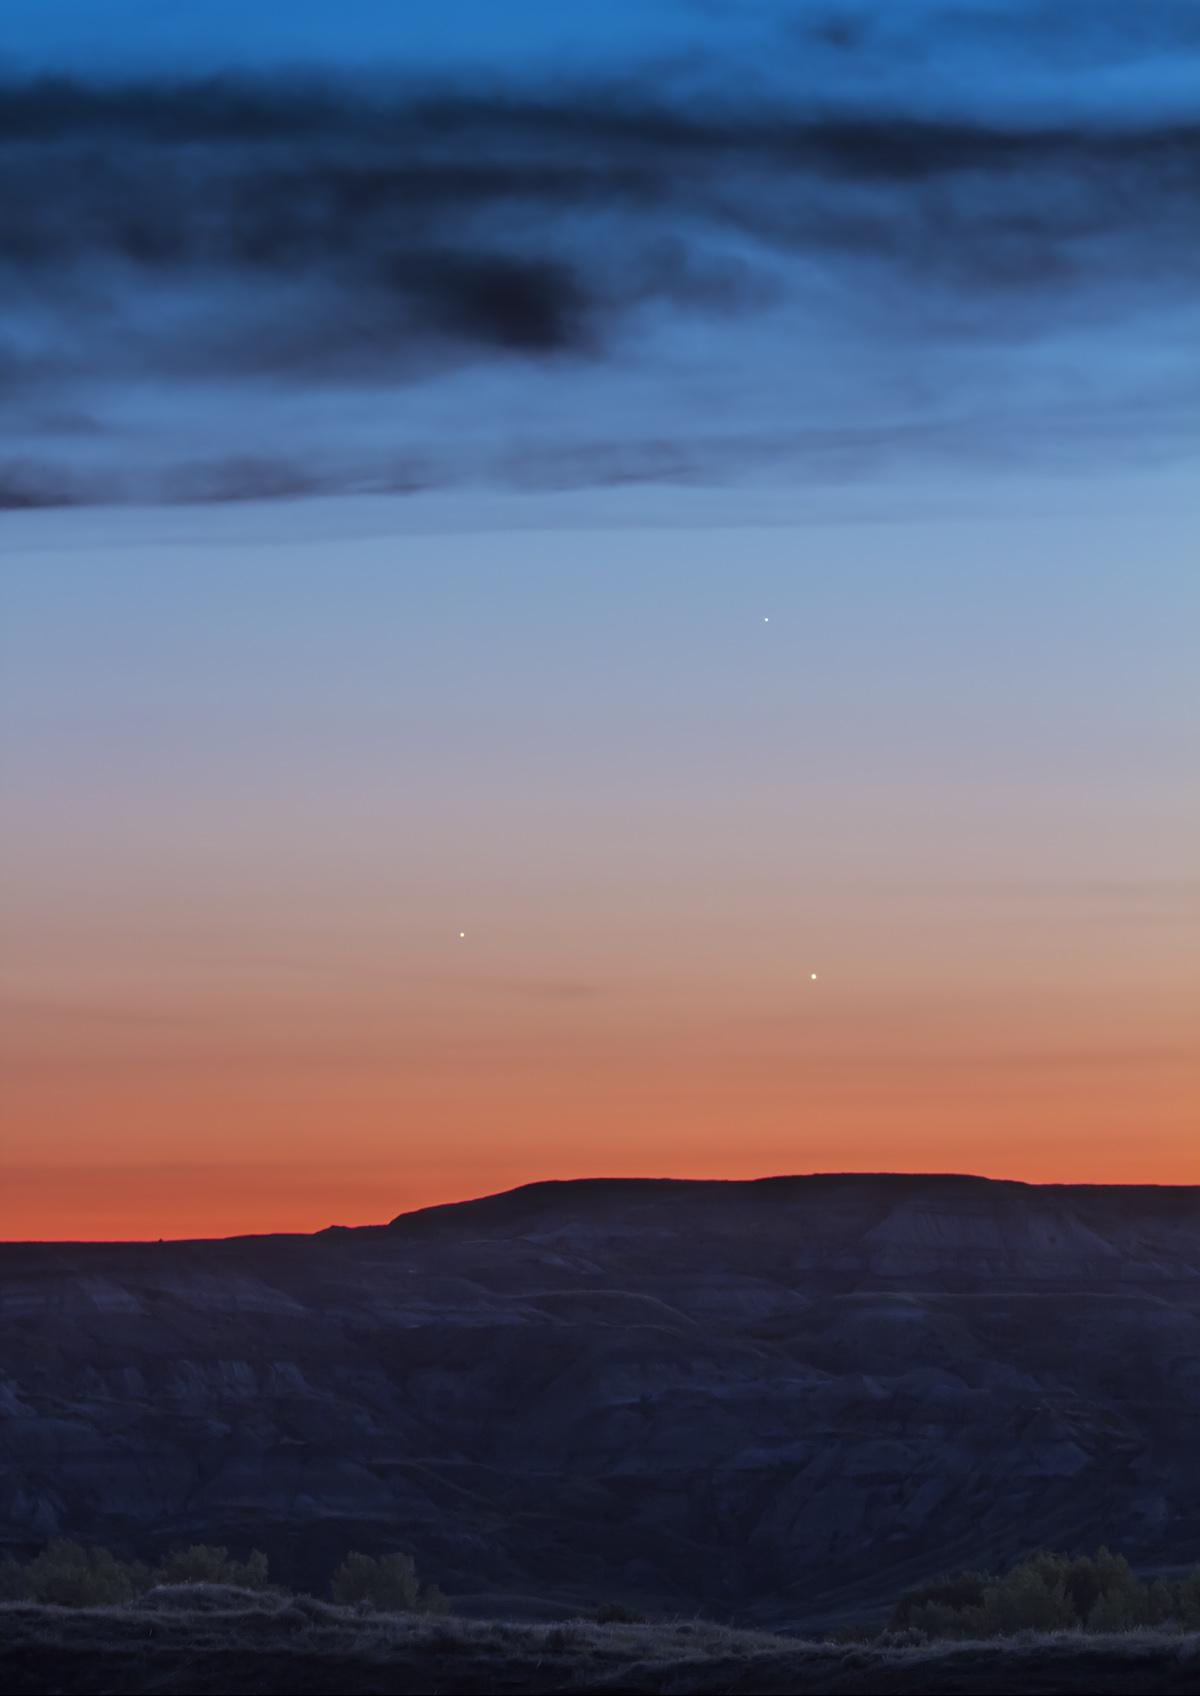 planets may 26 - photo #32